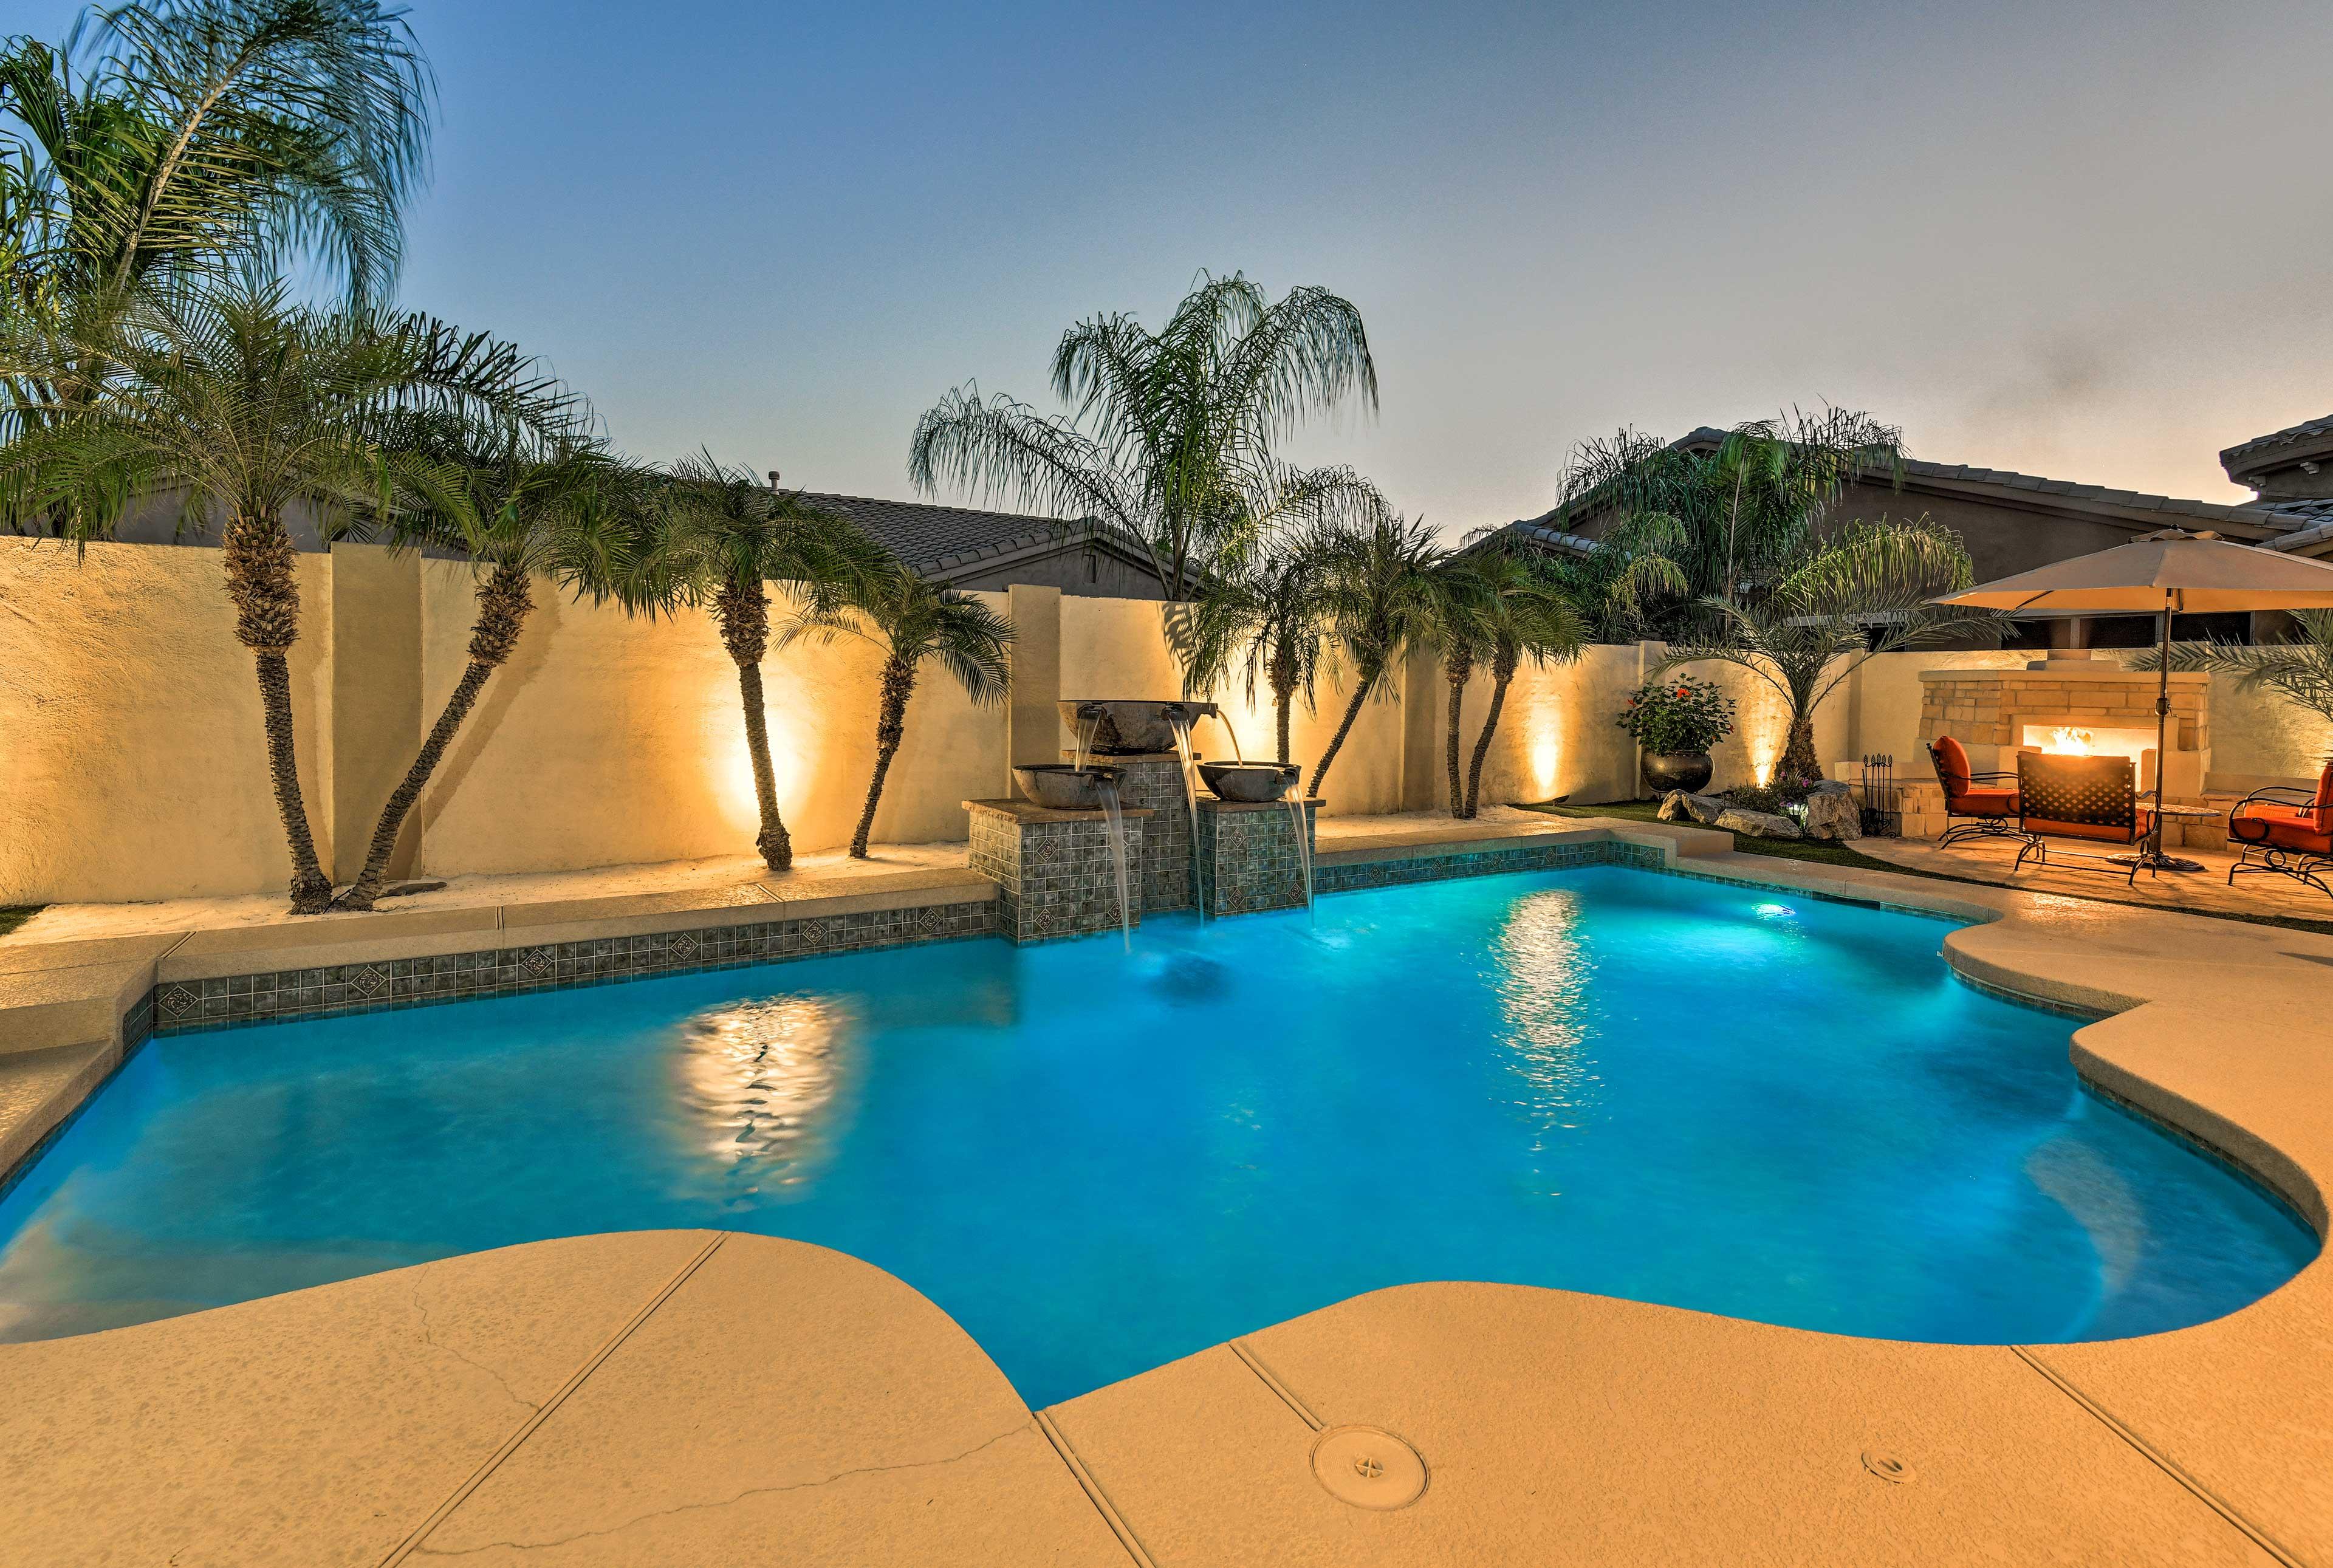 Private Backyard   Pool Lights